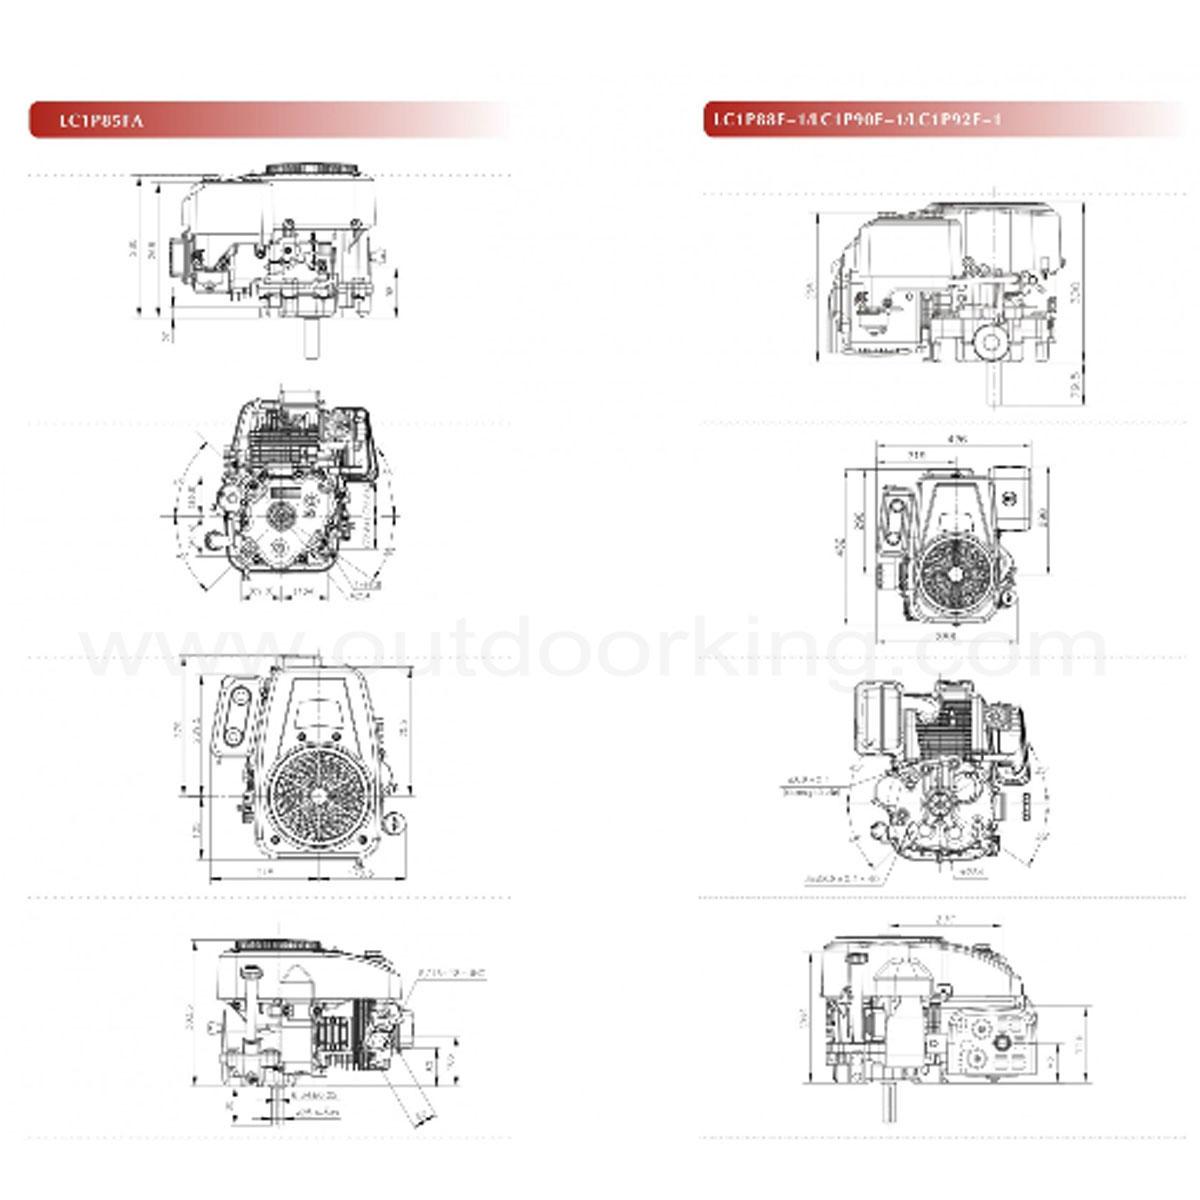 Loncin Genuine Ride On Mower LC1P90F-1 Engine [LC1P90F-1